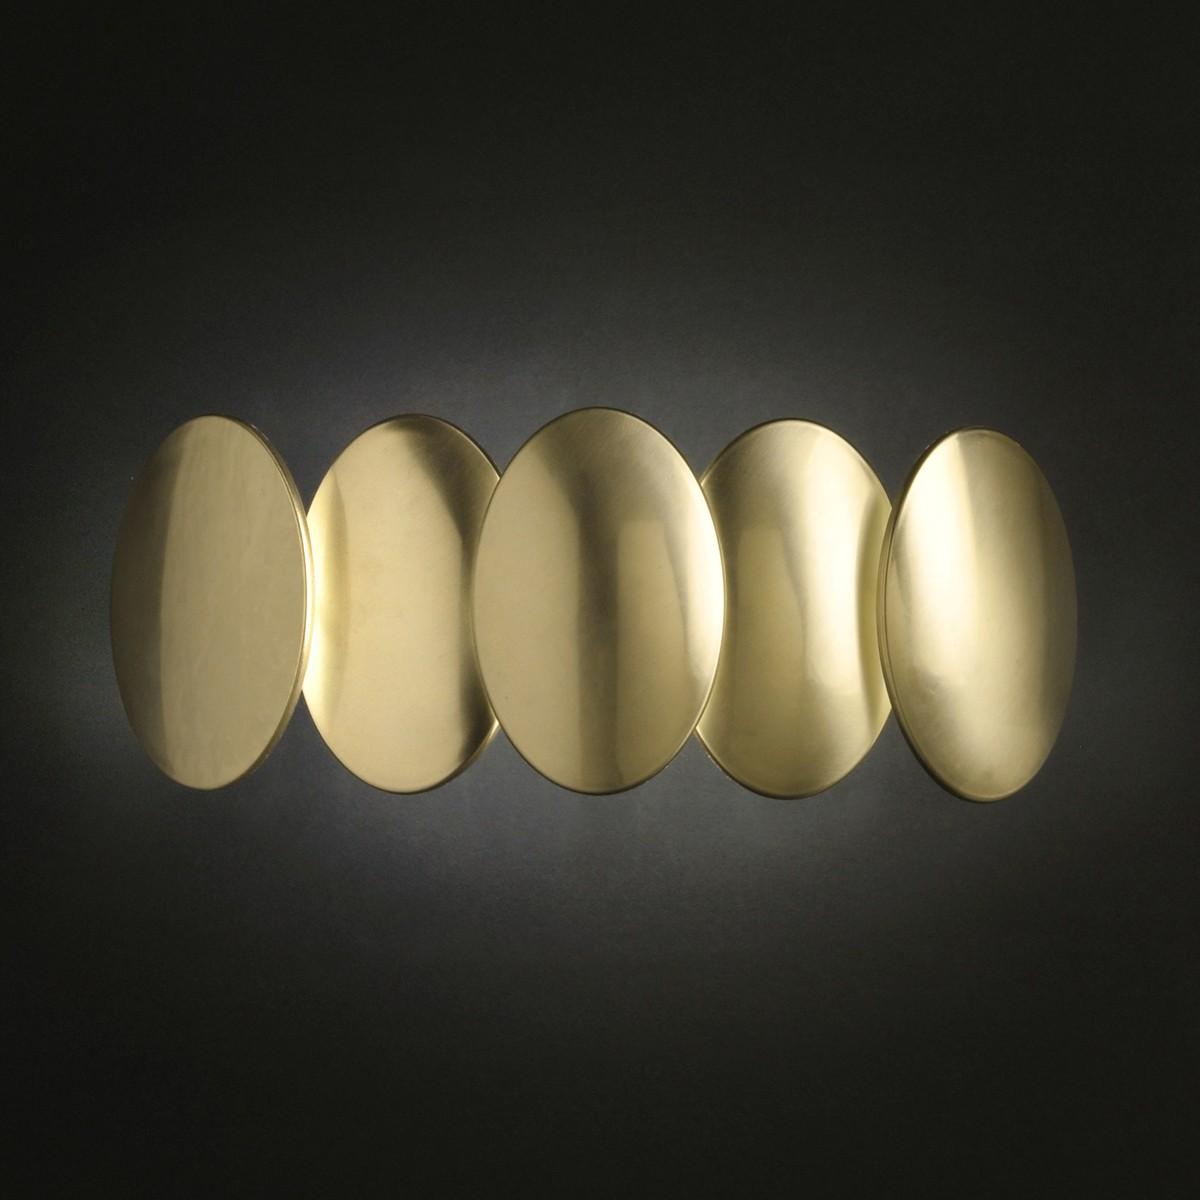 Milan Obolo Wandleuchte, 2-flg., Goldoptik gebürstet